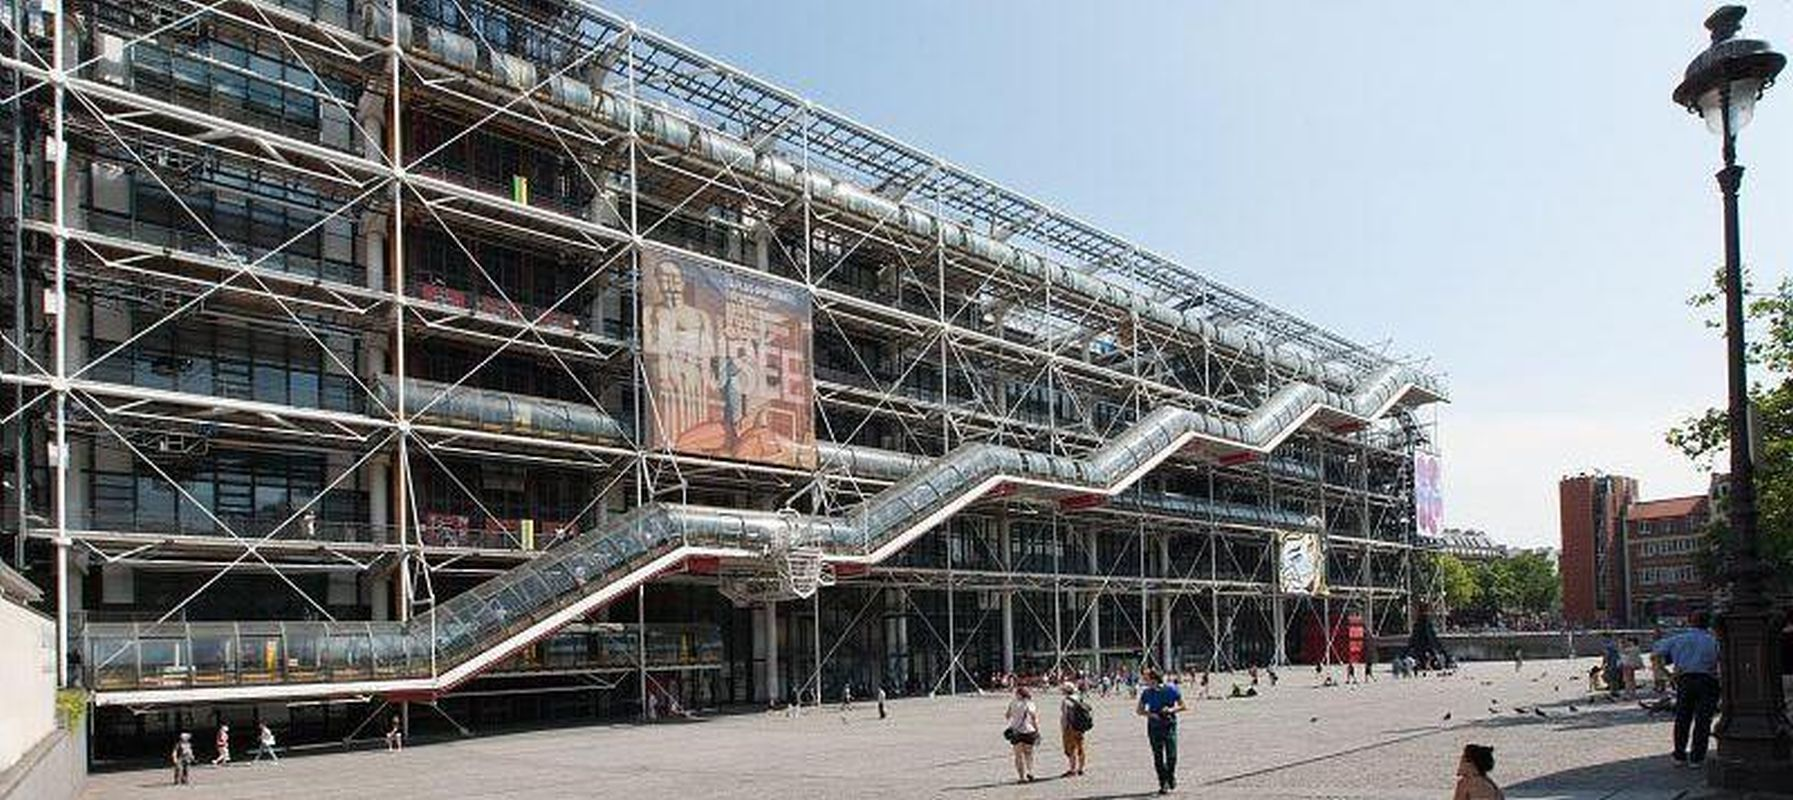 kiến trúc Pháp hiện đại 2